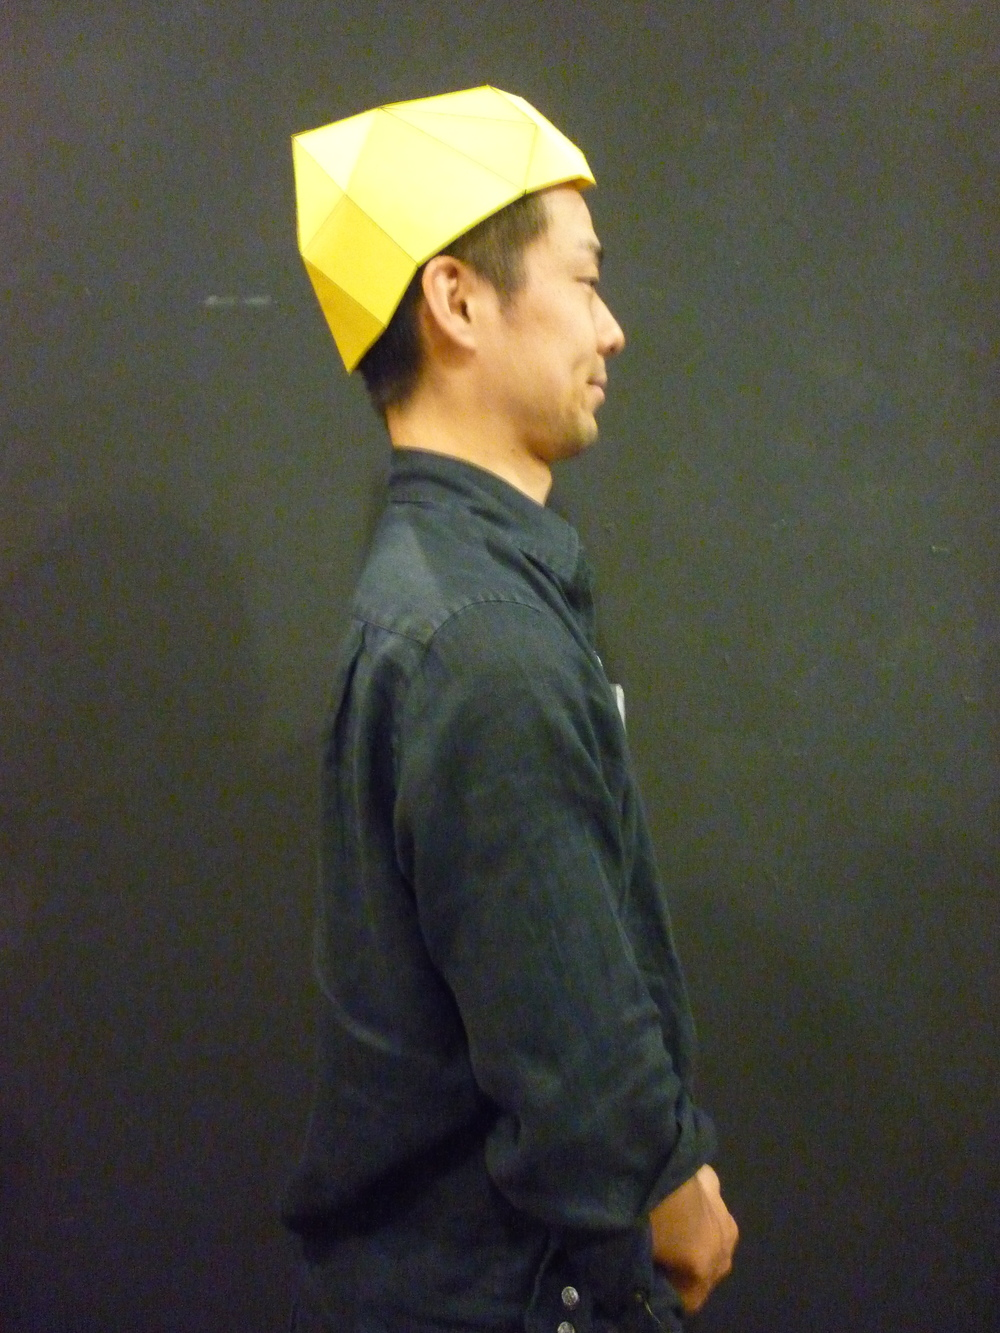 P1110478.JPG